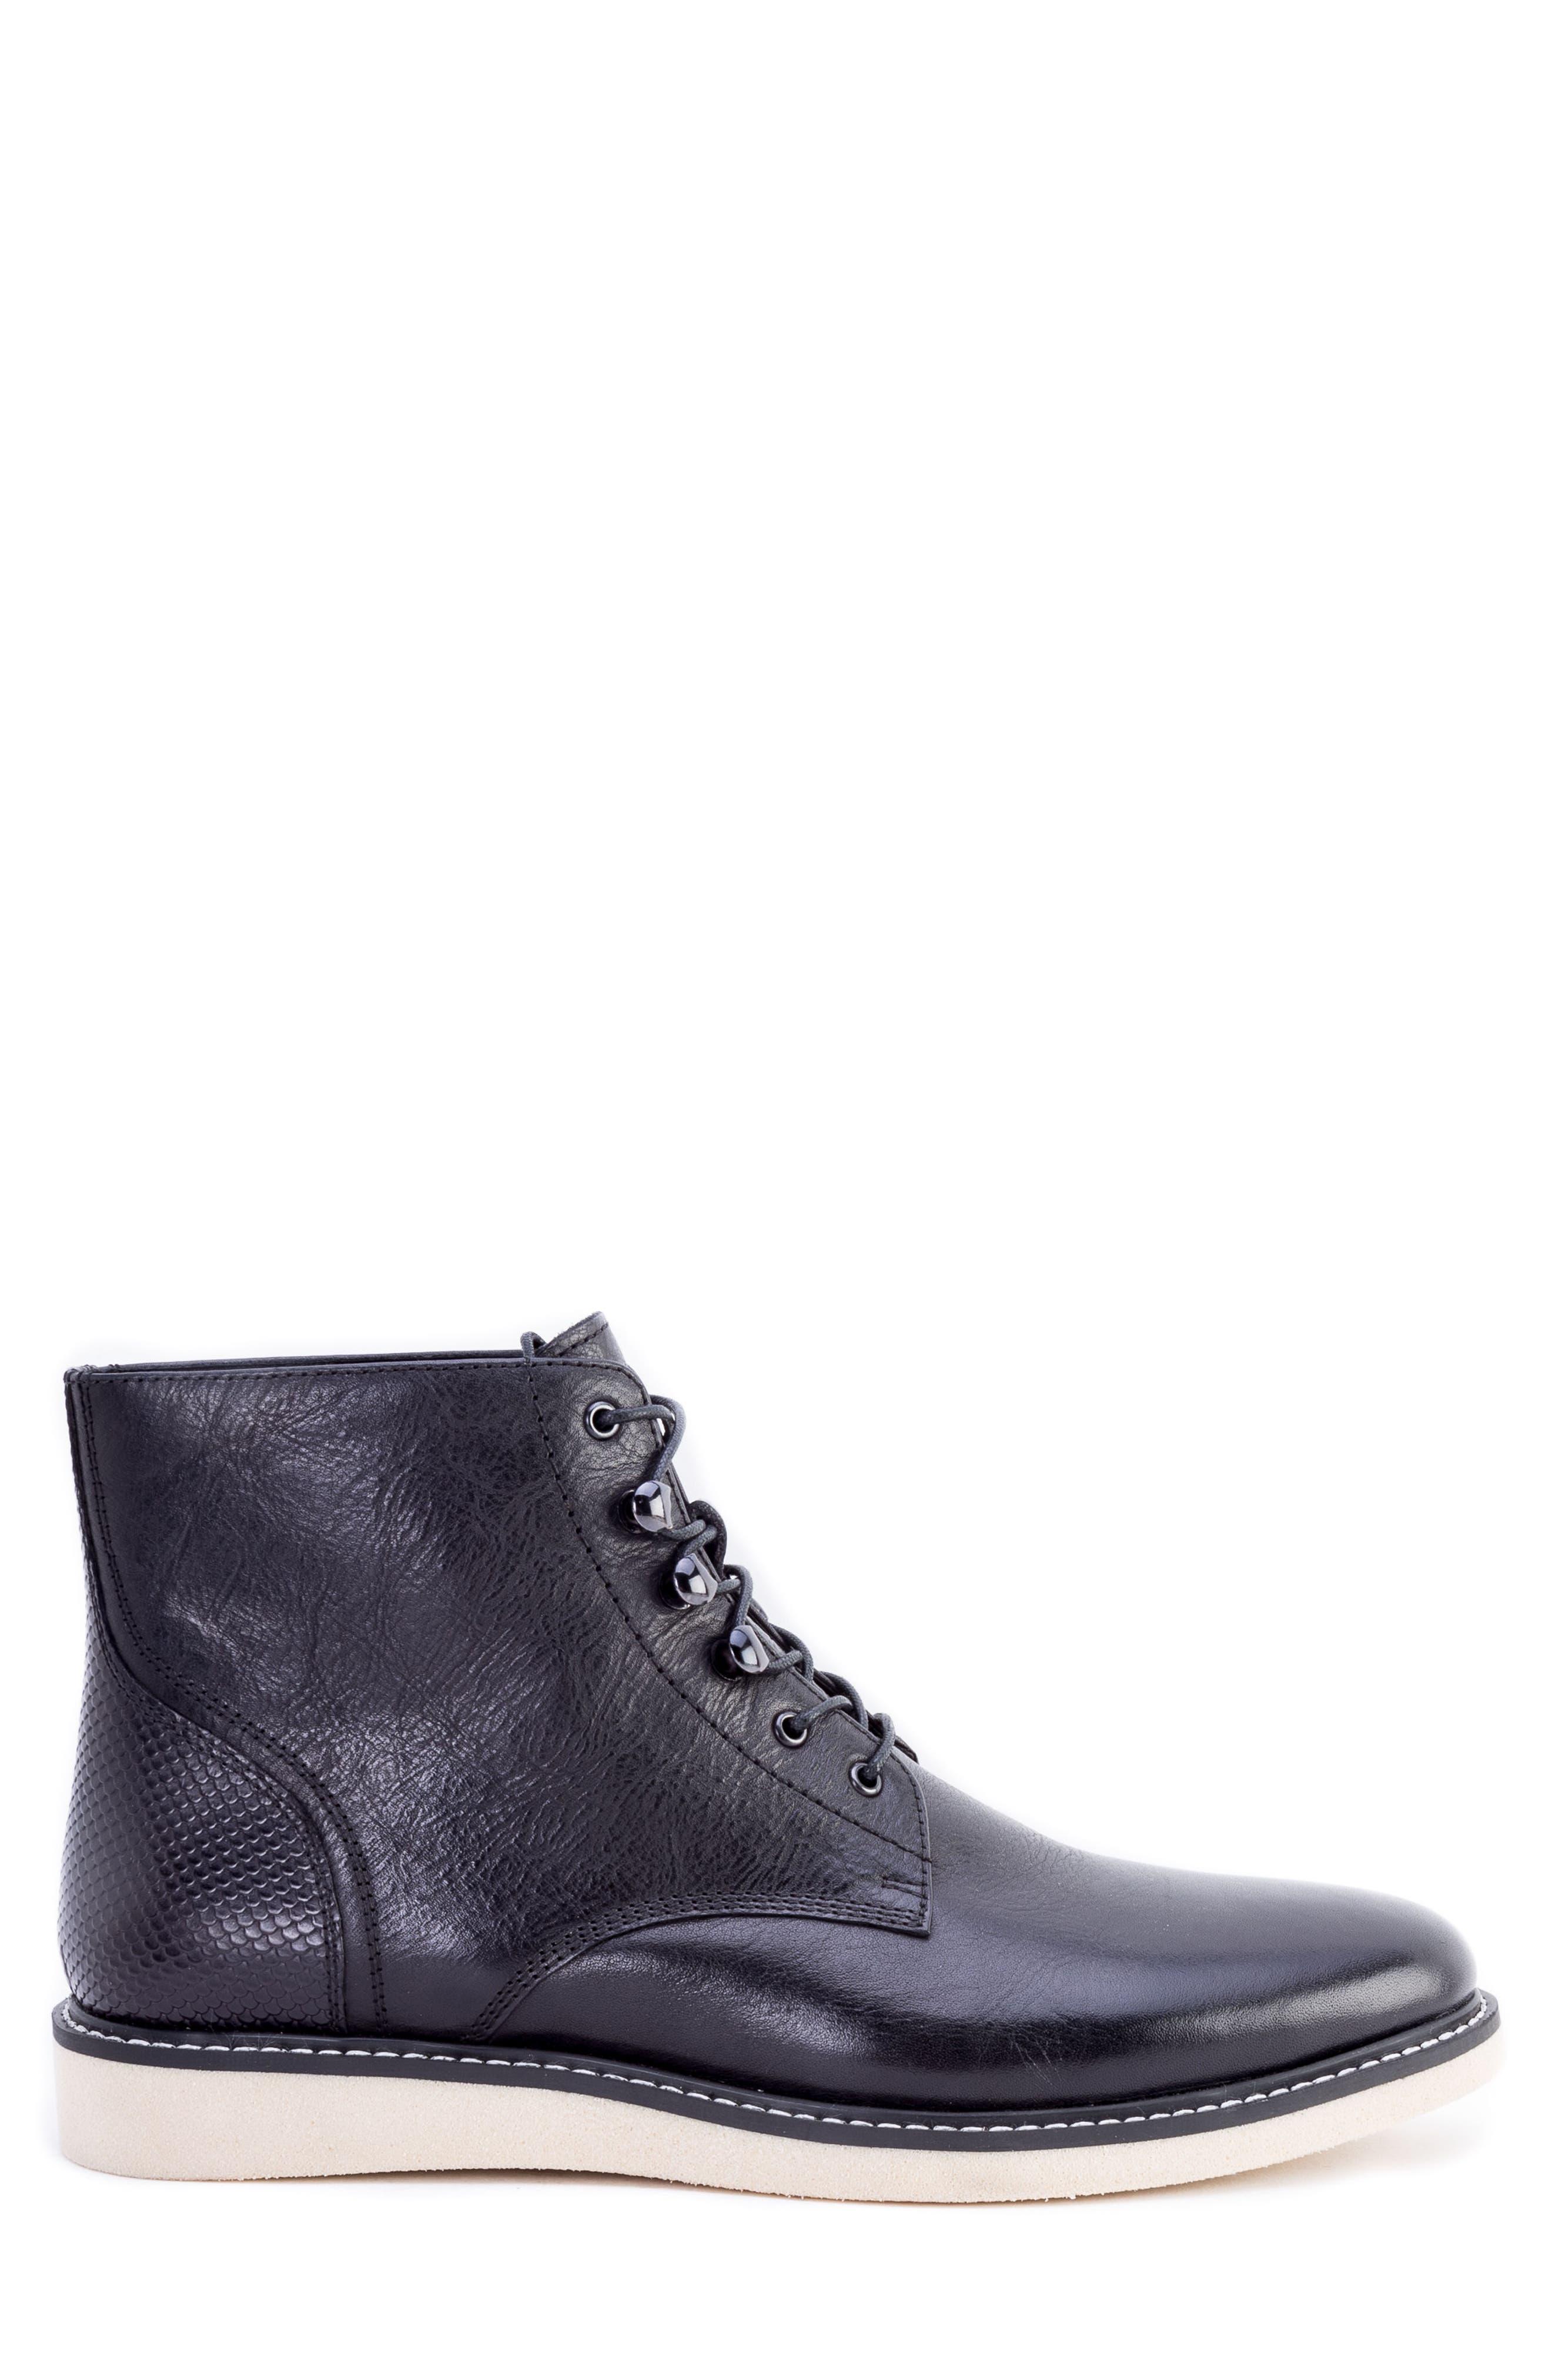 Finch Plain Toe Boot,                             Alternate thumbnail 3, color,                             BLACK LEATHER